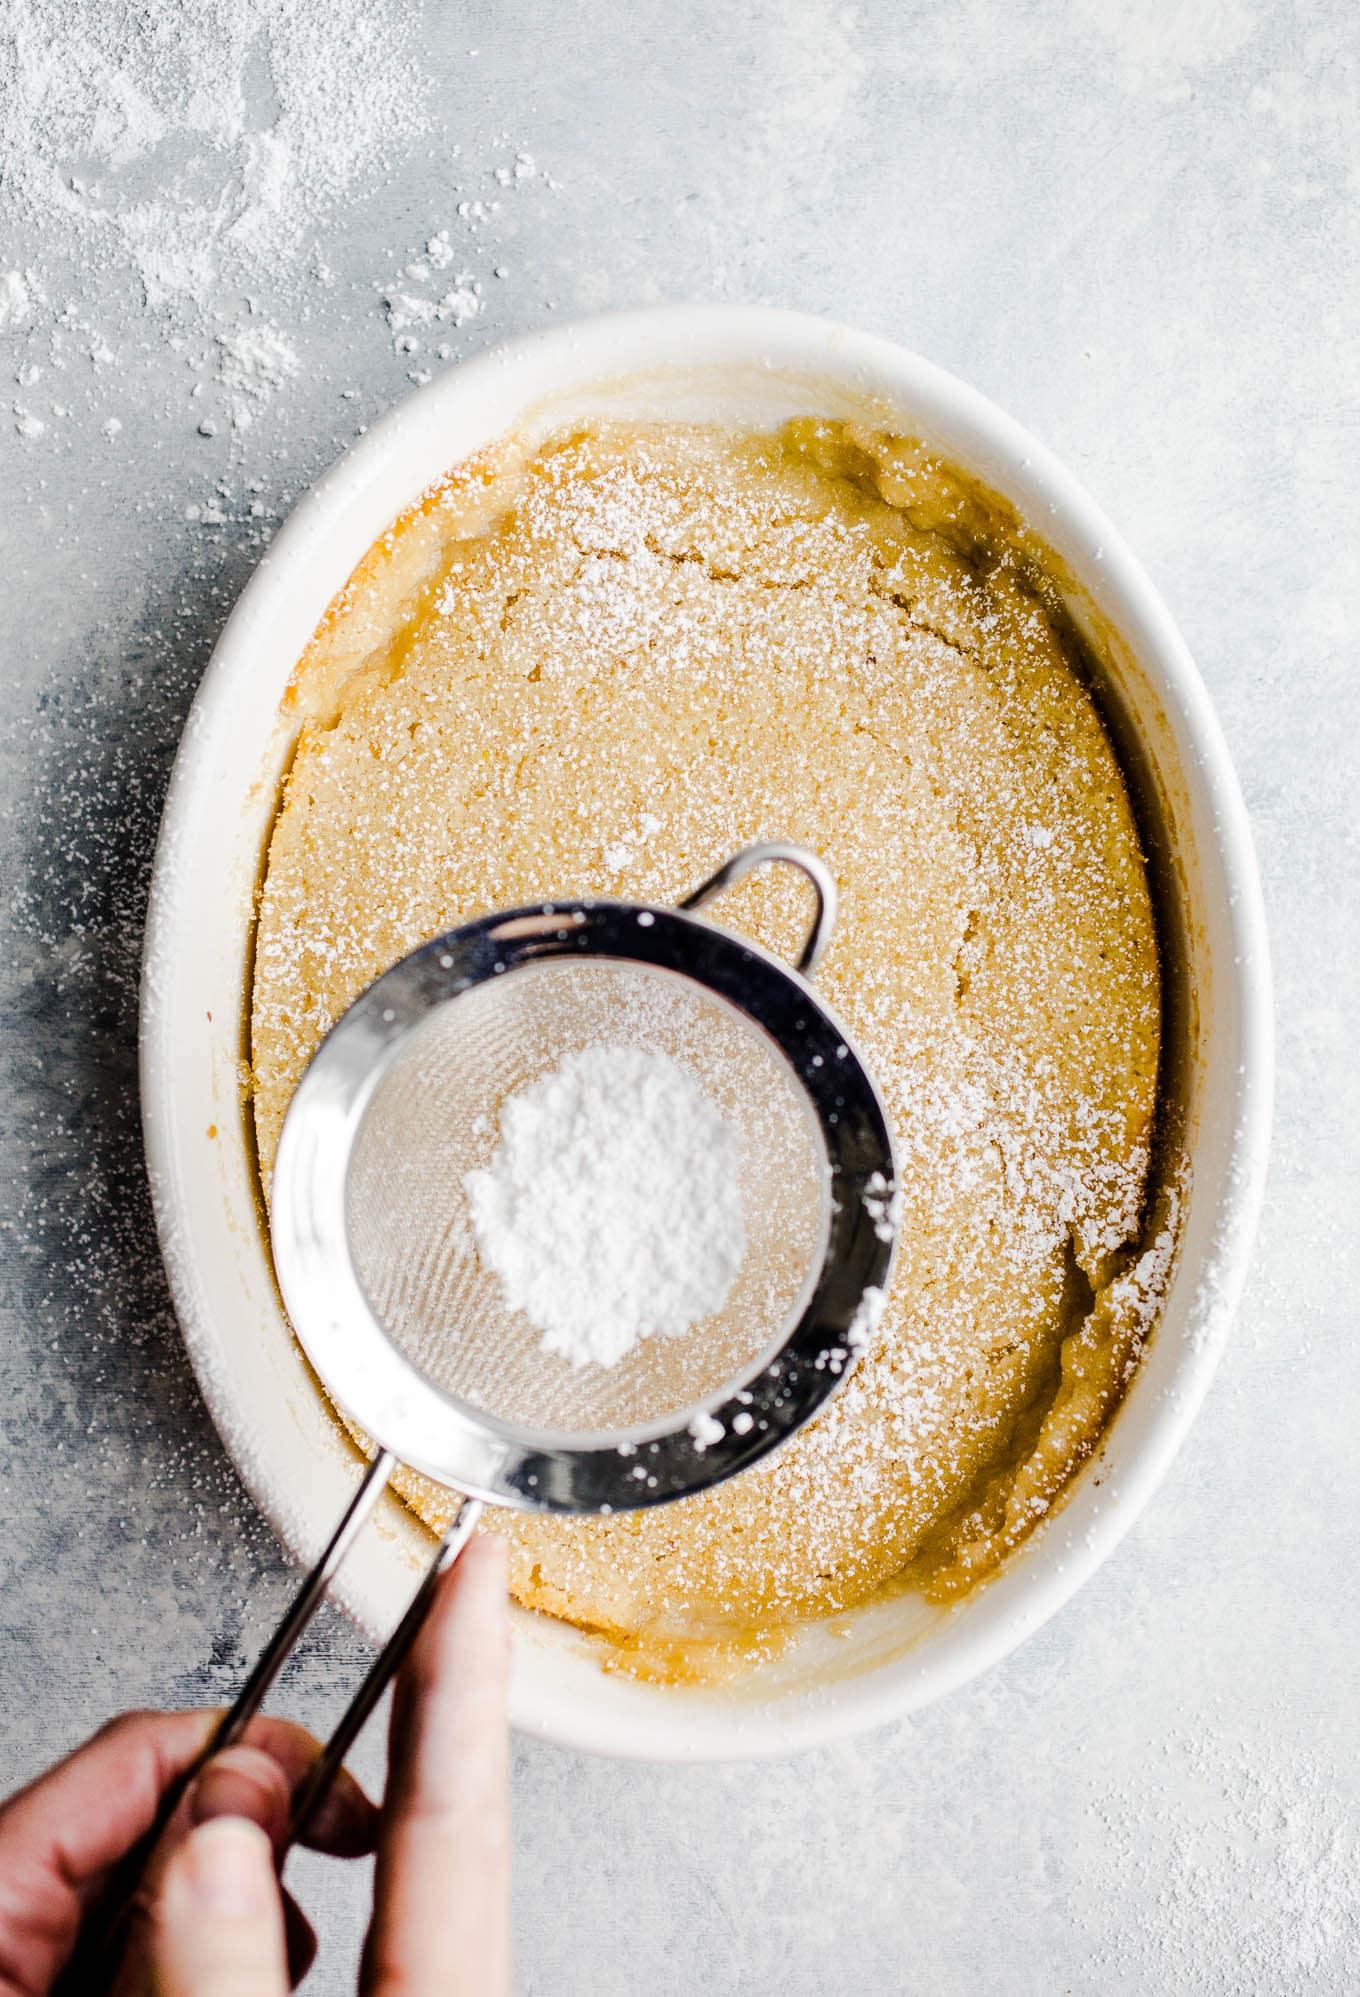 lemon pudding cake sprinkled with powdered sugar